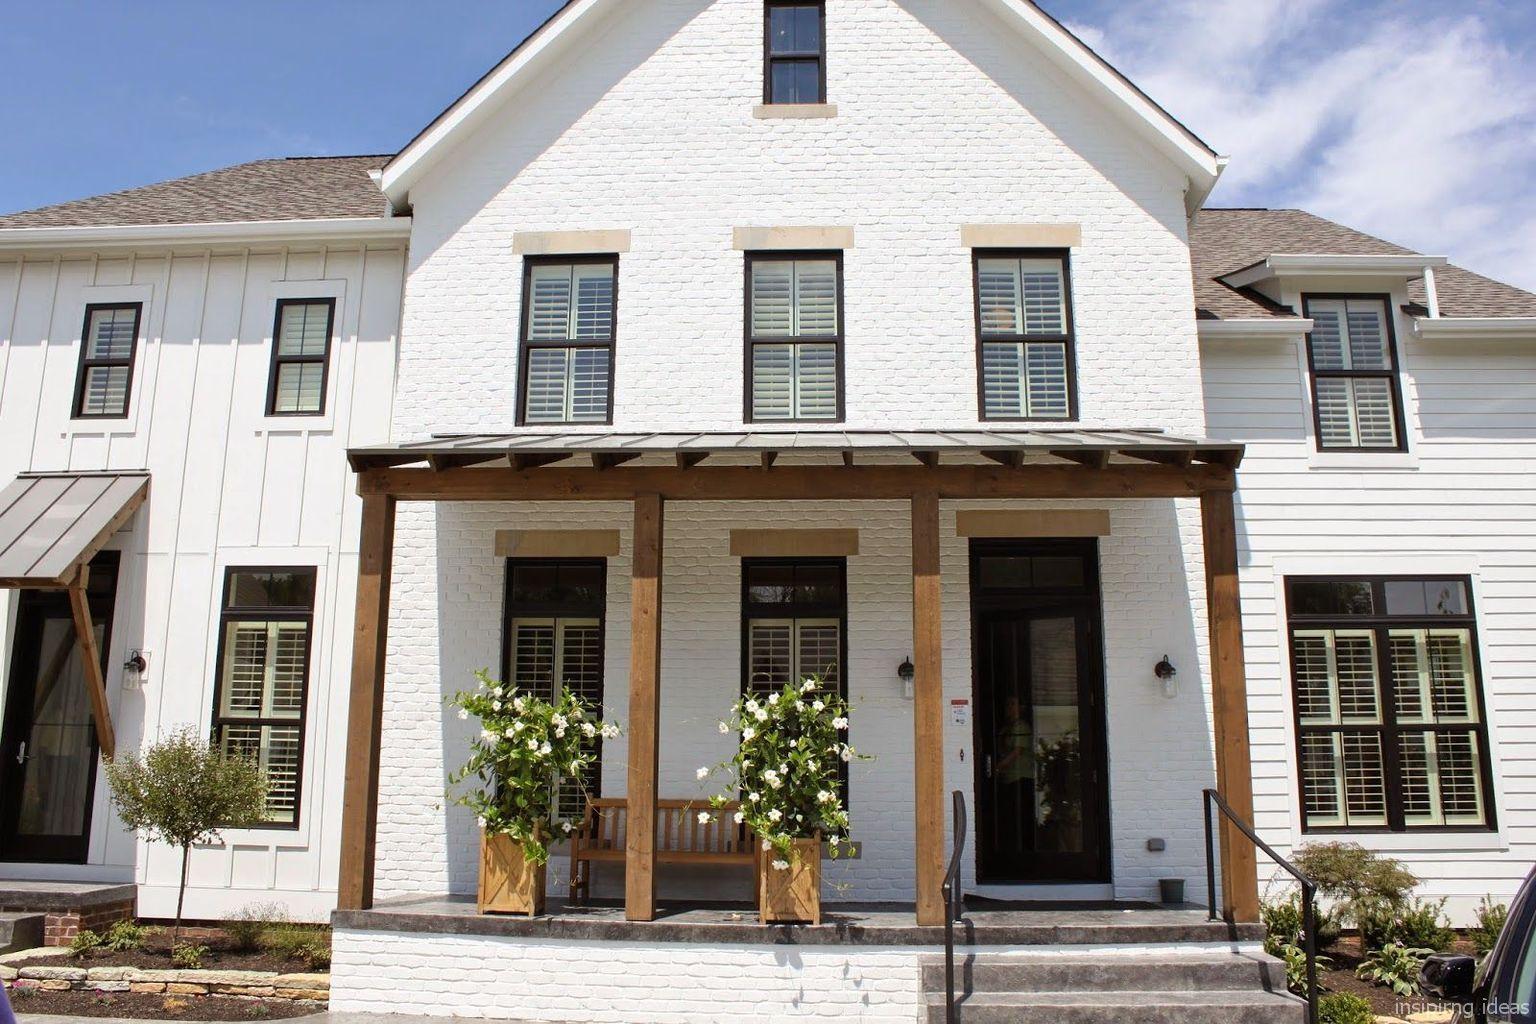 Exterior window trim design ideas   astonishing eksterior u interior window trim ideas for your